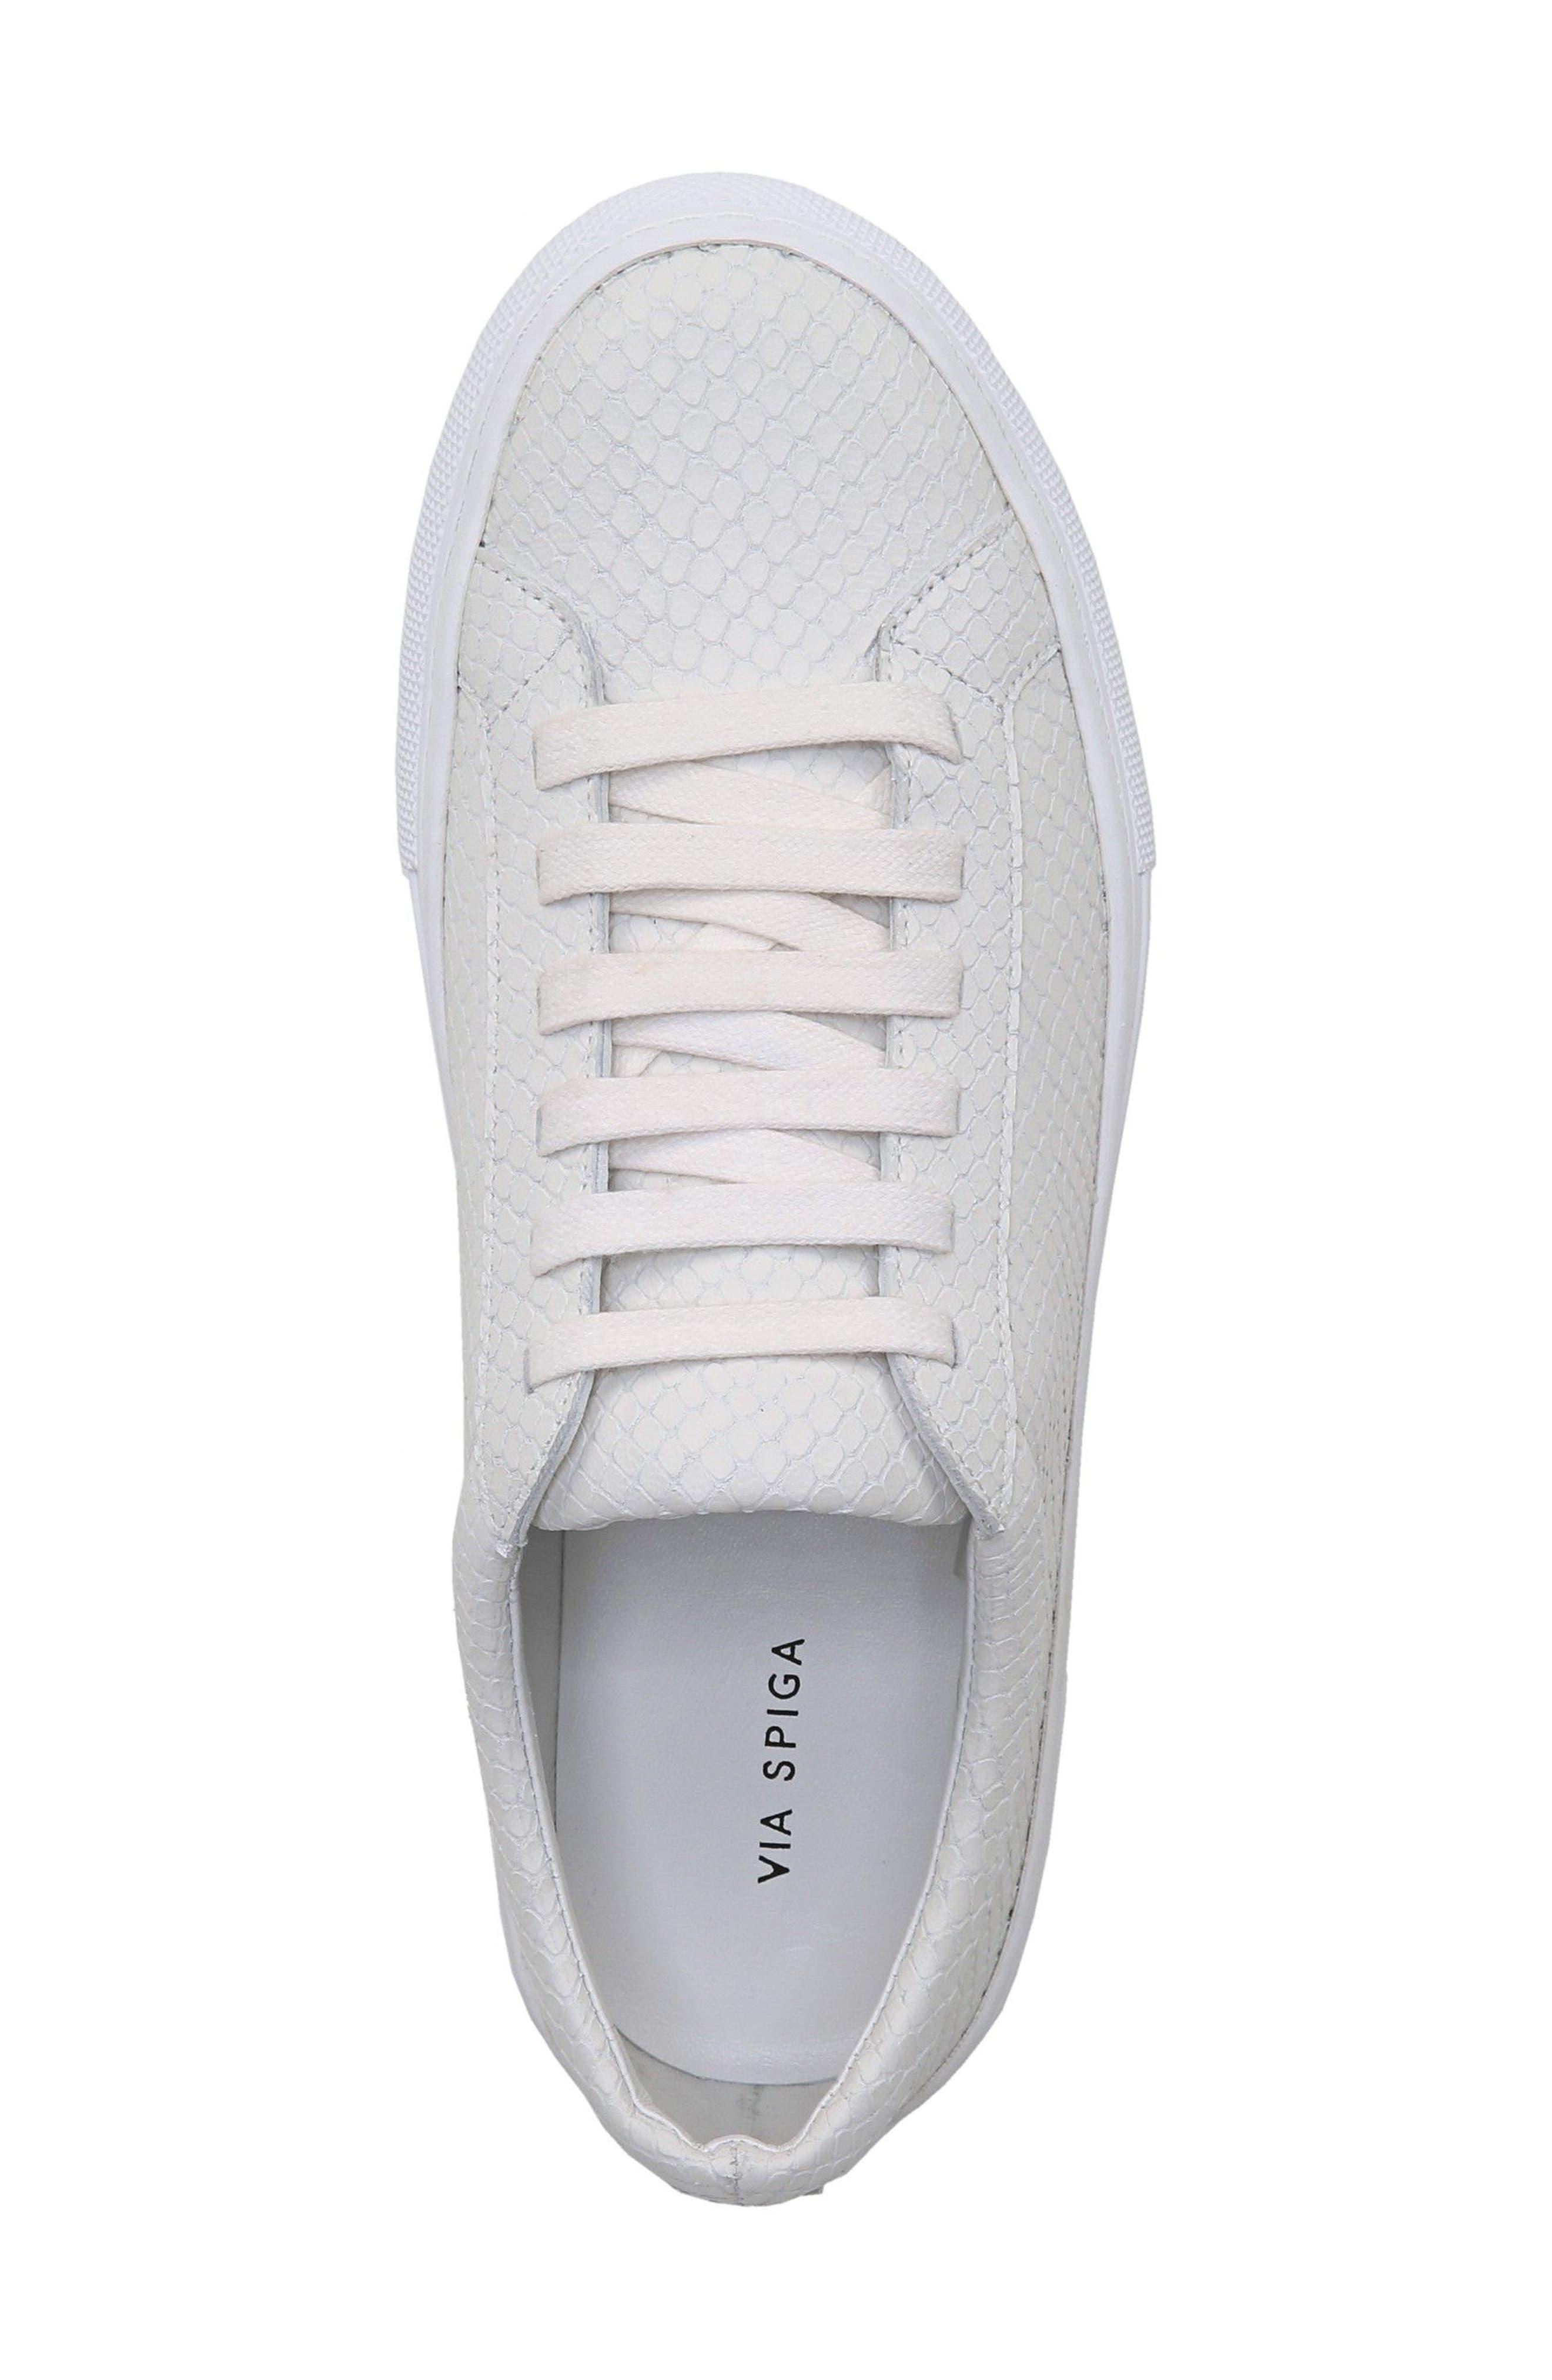 SUIV2 Snake Embossed Sneaker,                             Alternate thumbnail 4, color,                             Porcelain Leather